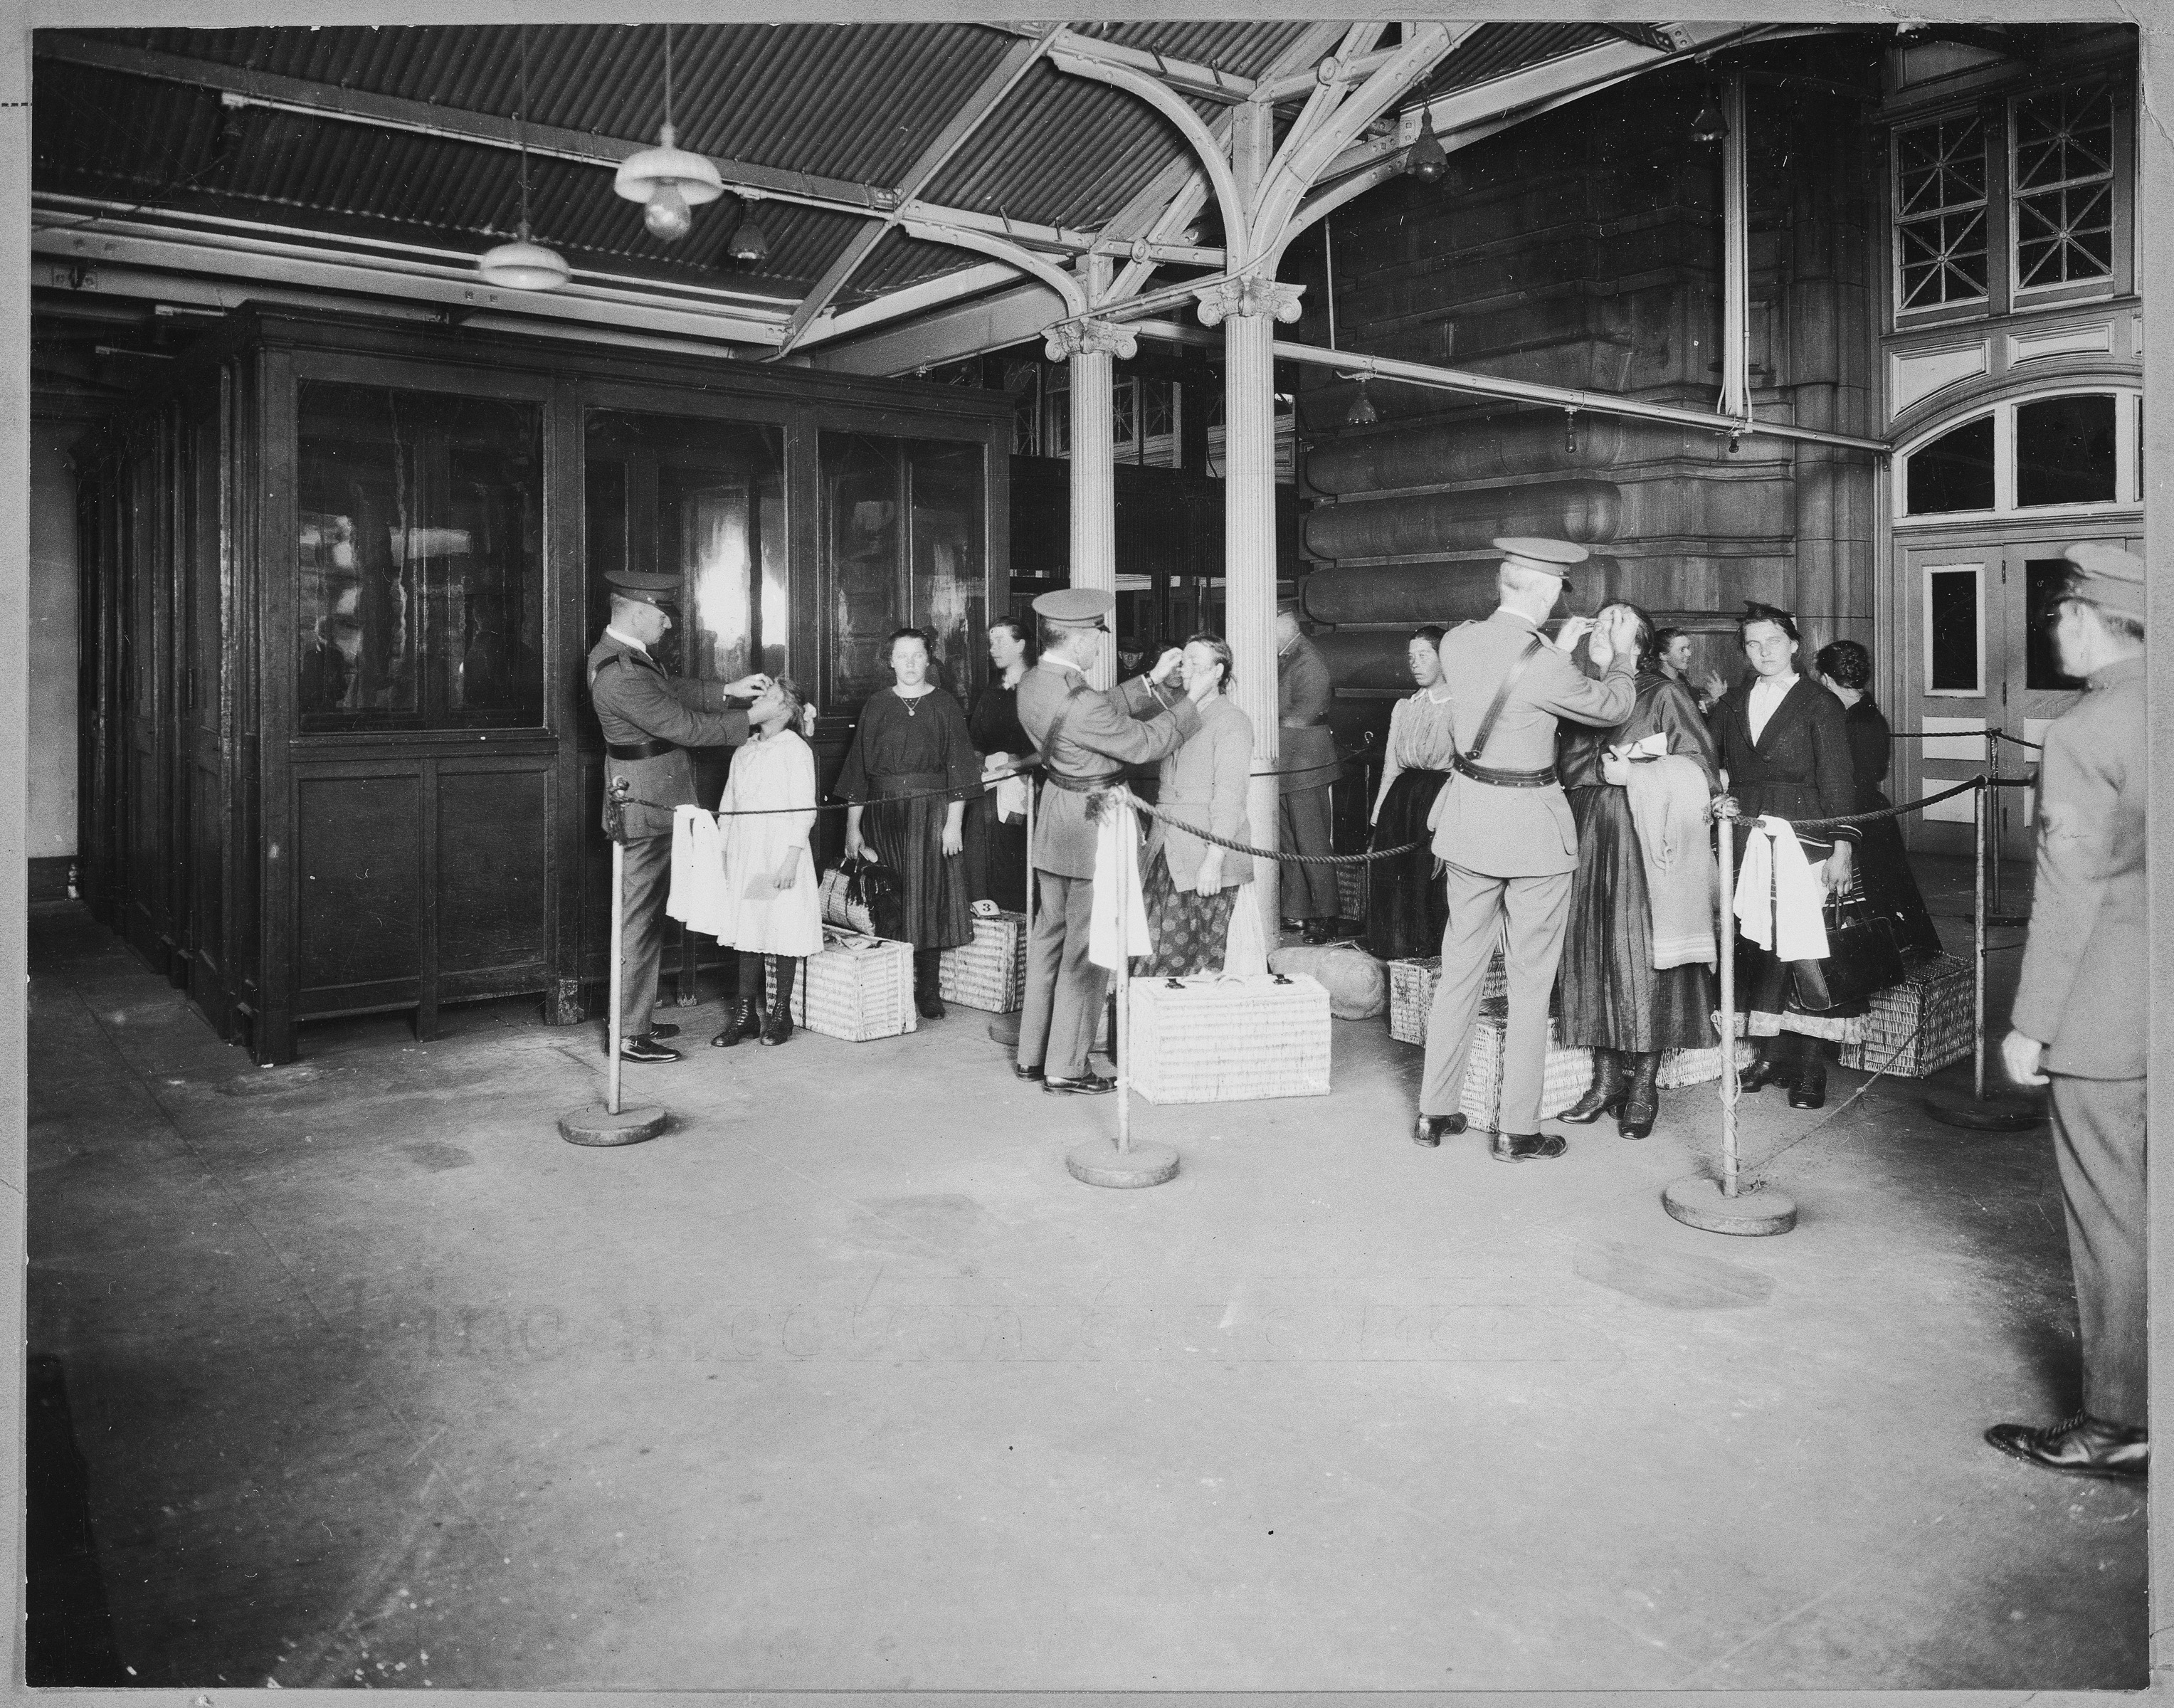 Ellis Island, N.Y. Line Inspection of Arriving Aliens, 1923 (National Archives Identifier 6116683)